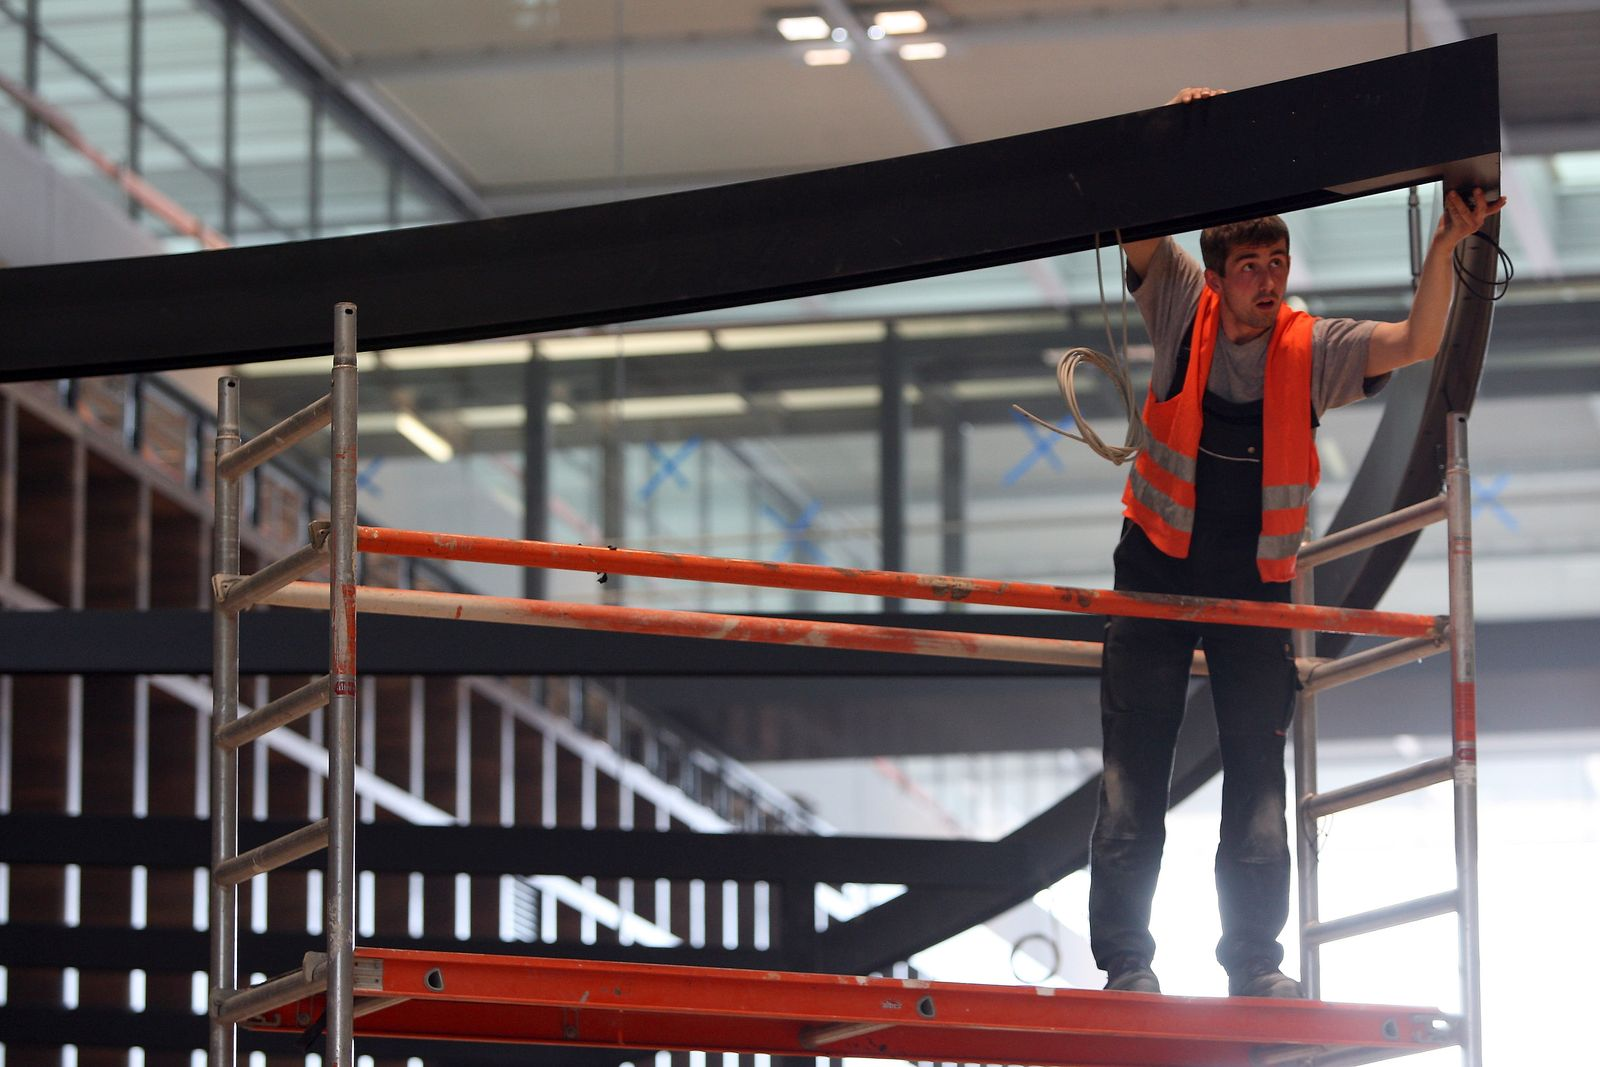 Hauptstadtflughafen / Willy Brandt Airport